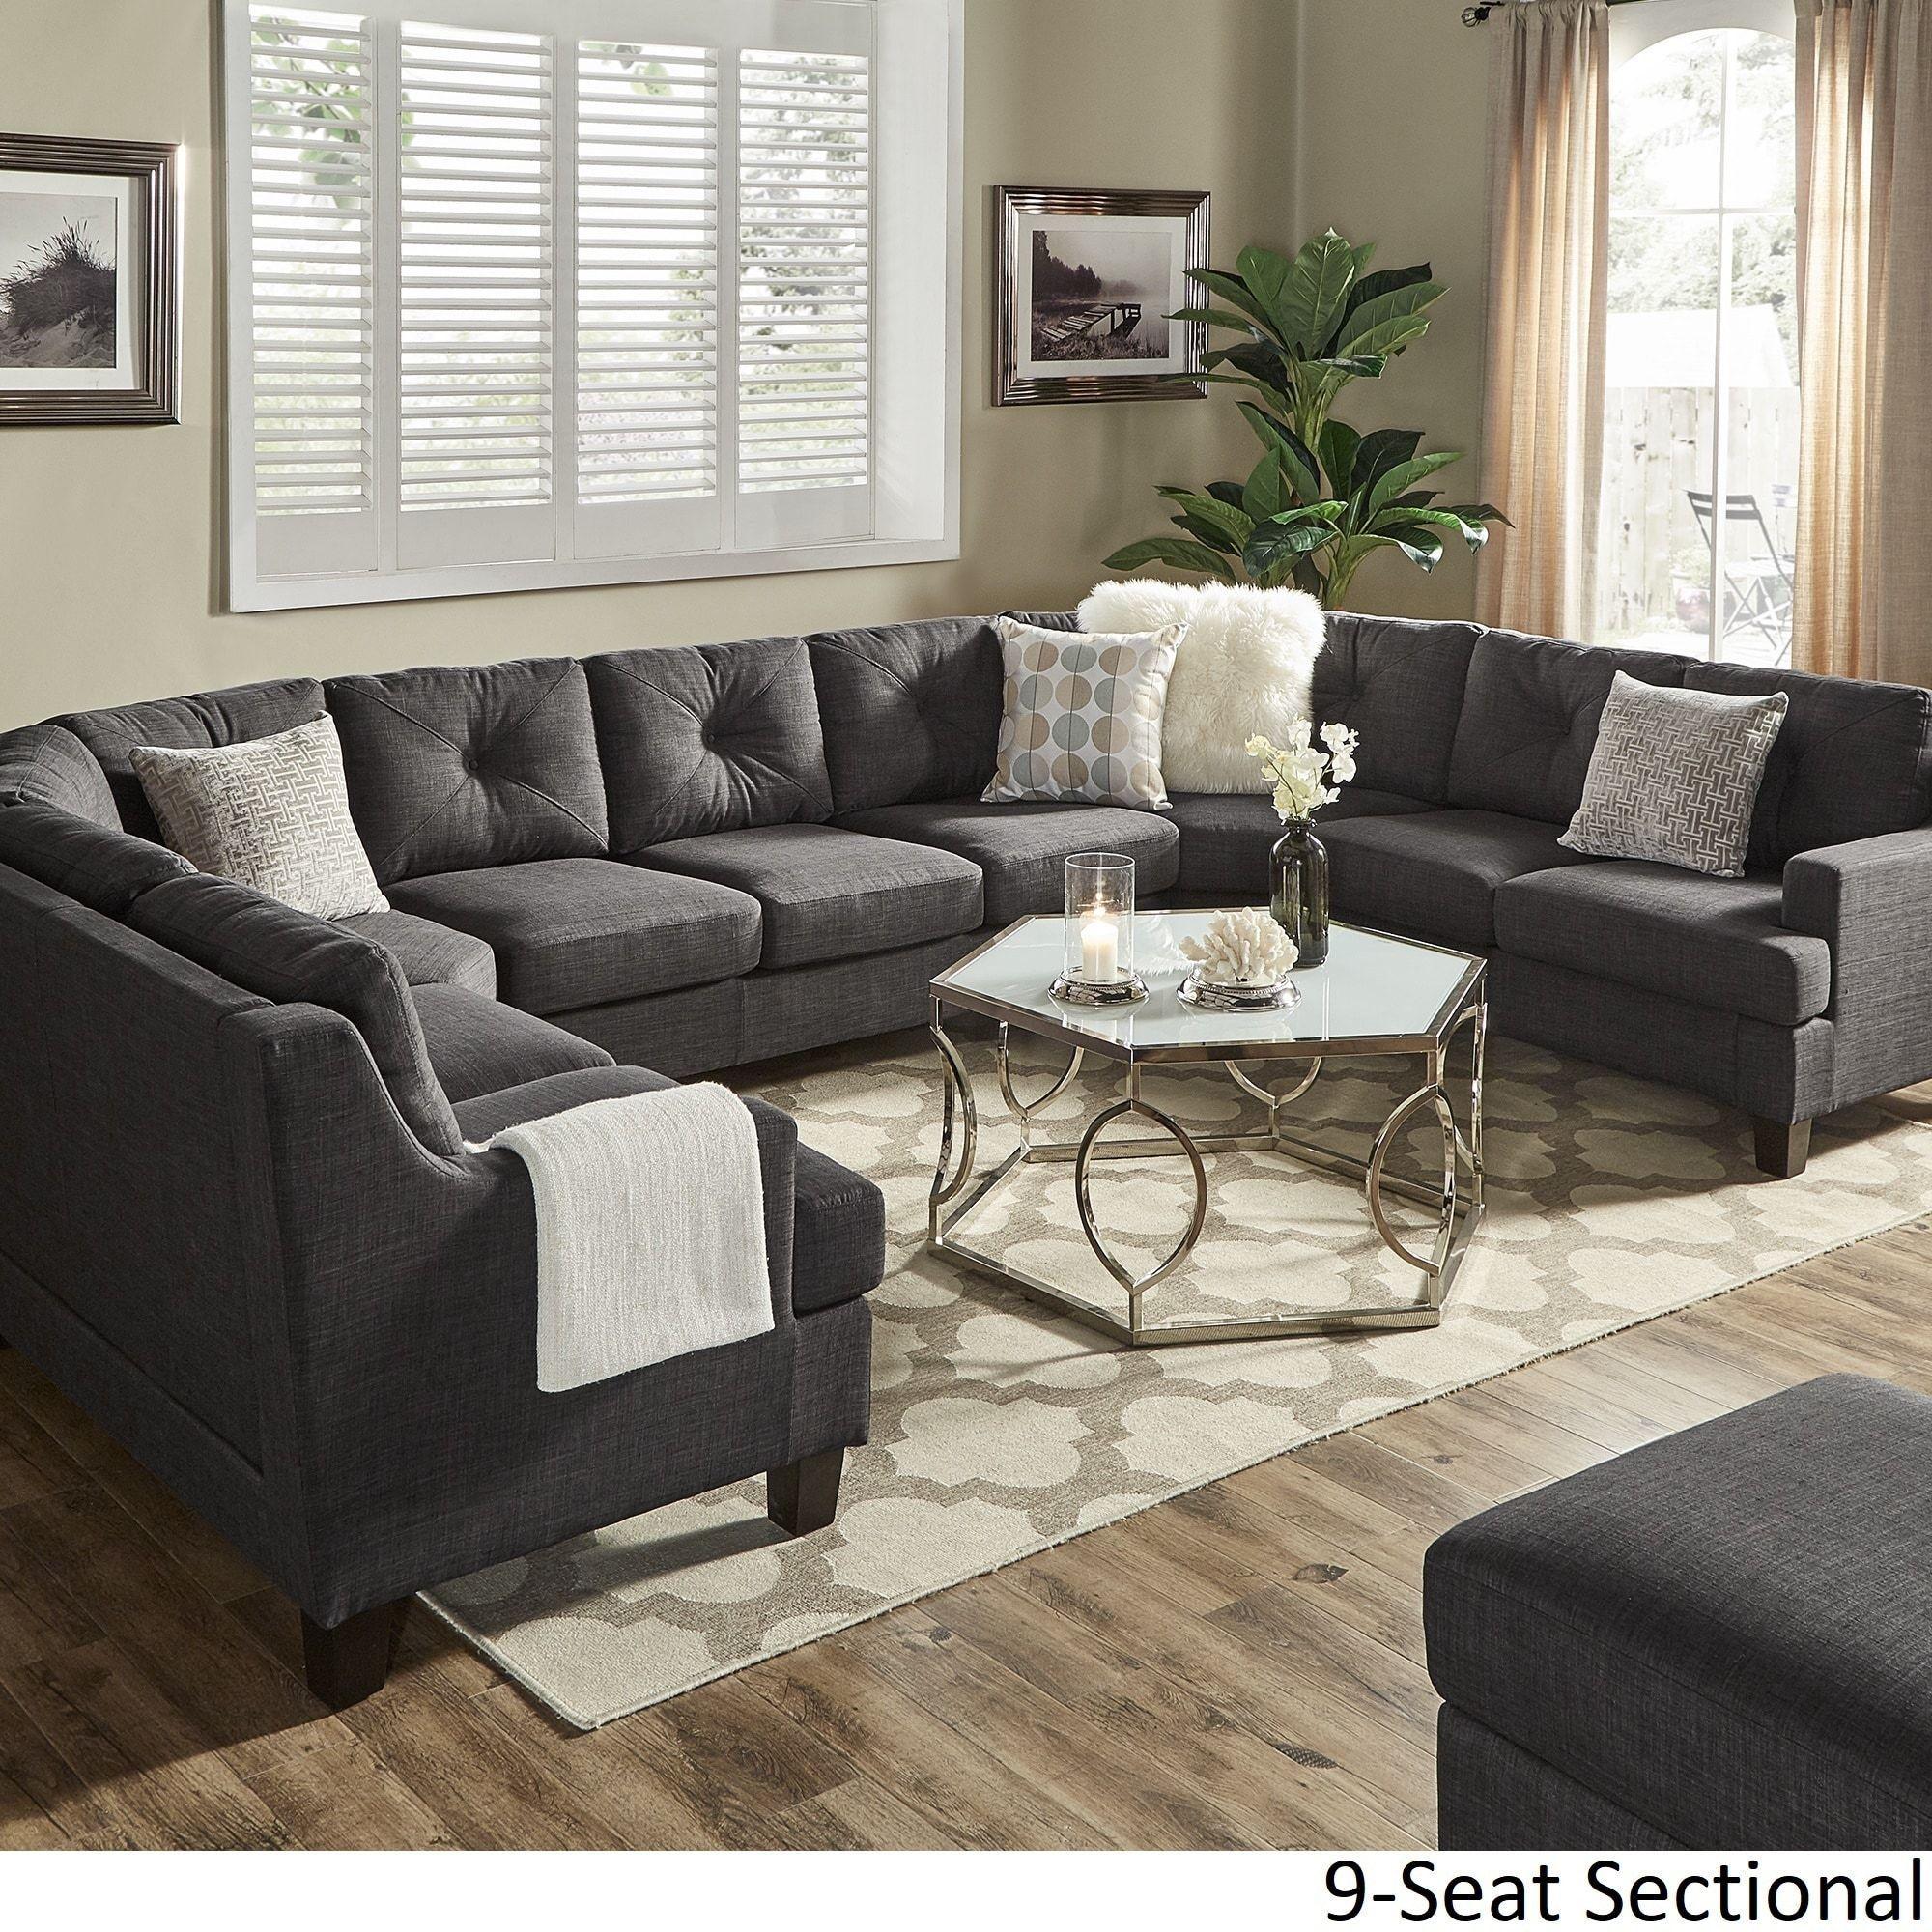 Living Room Inspiration | Latest Living Room Ideas ...